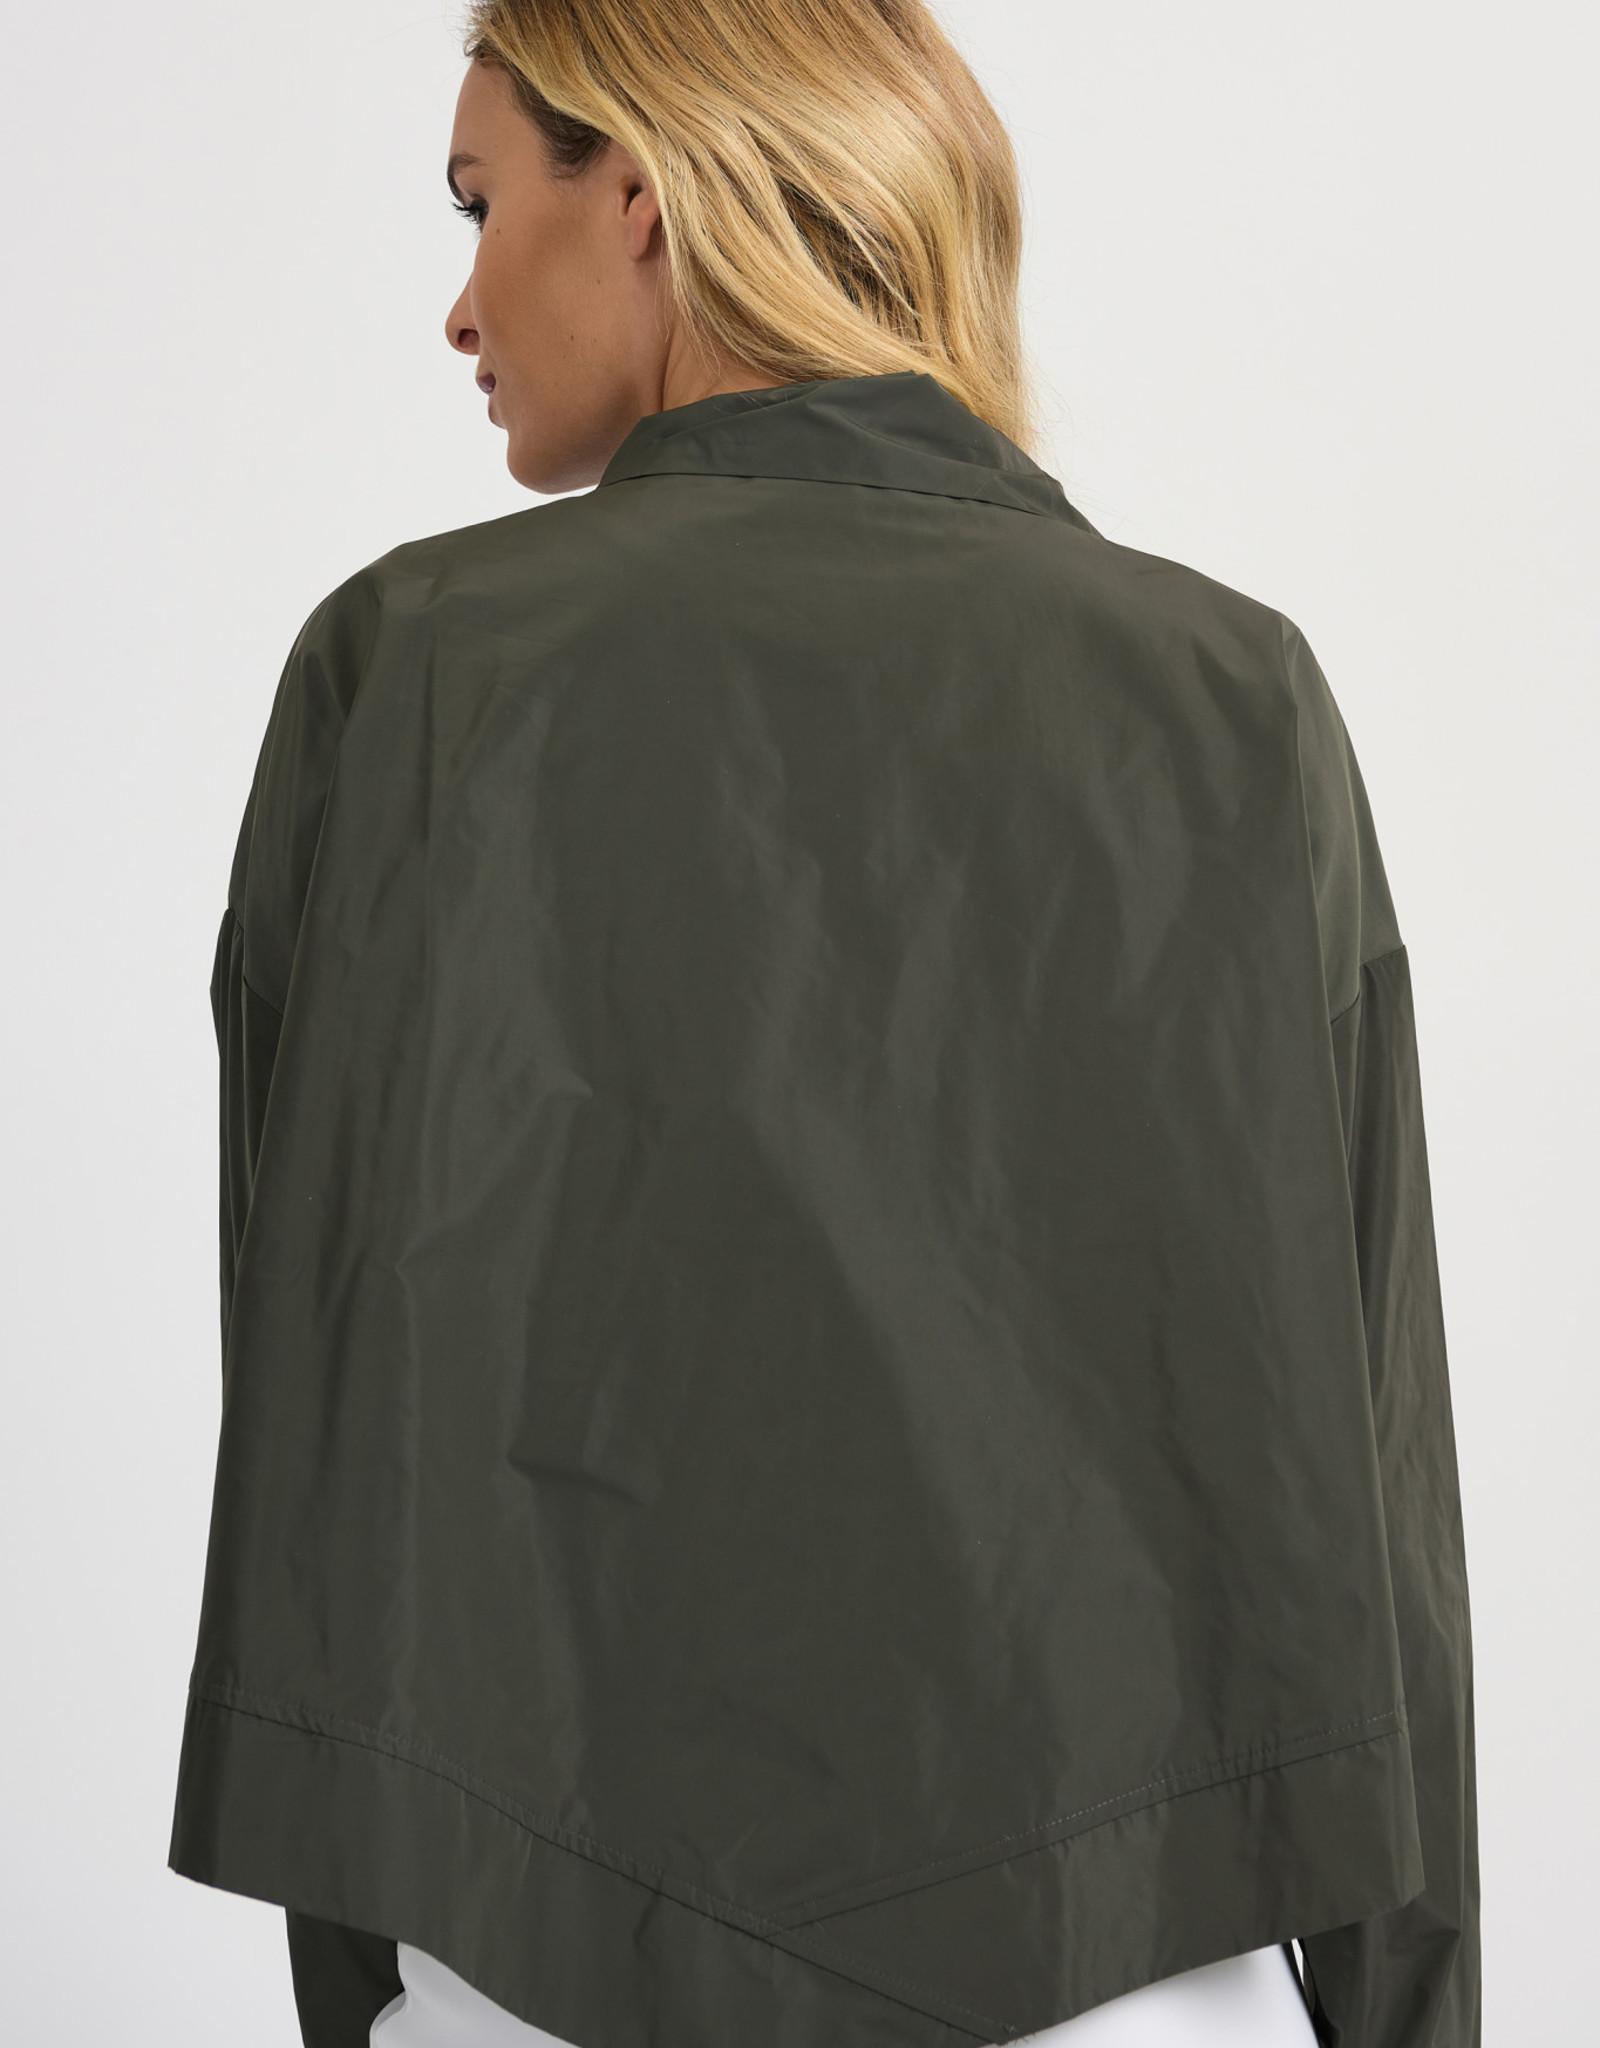 Joseph Ribkoff Joseph Ribkoff 201069 LDS jacket